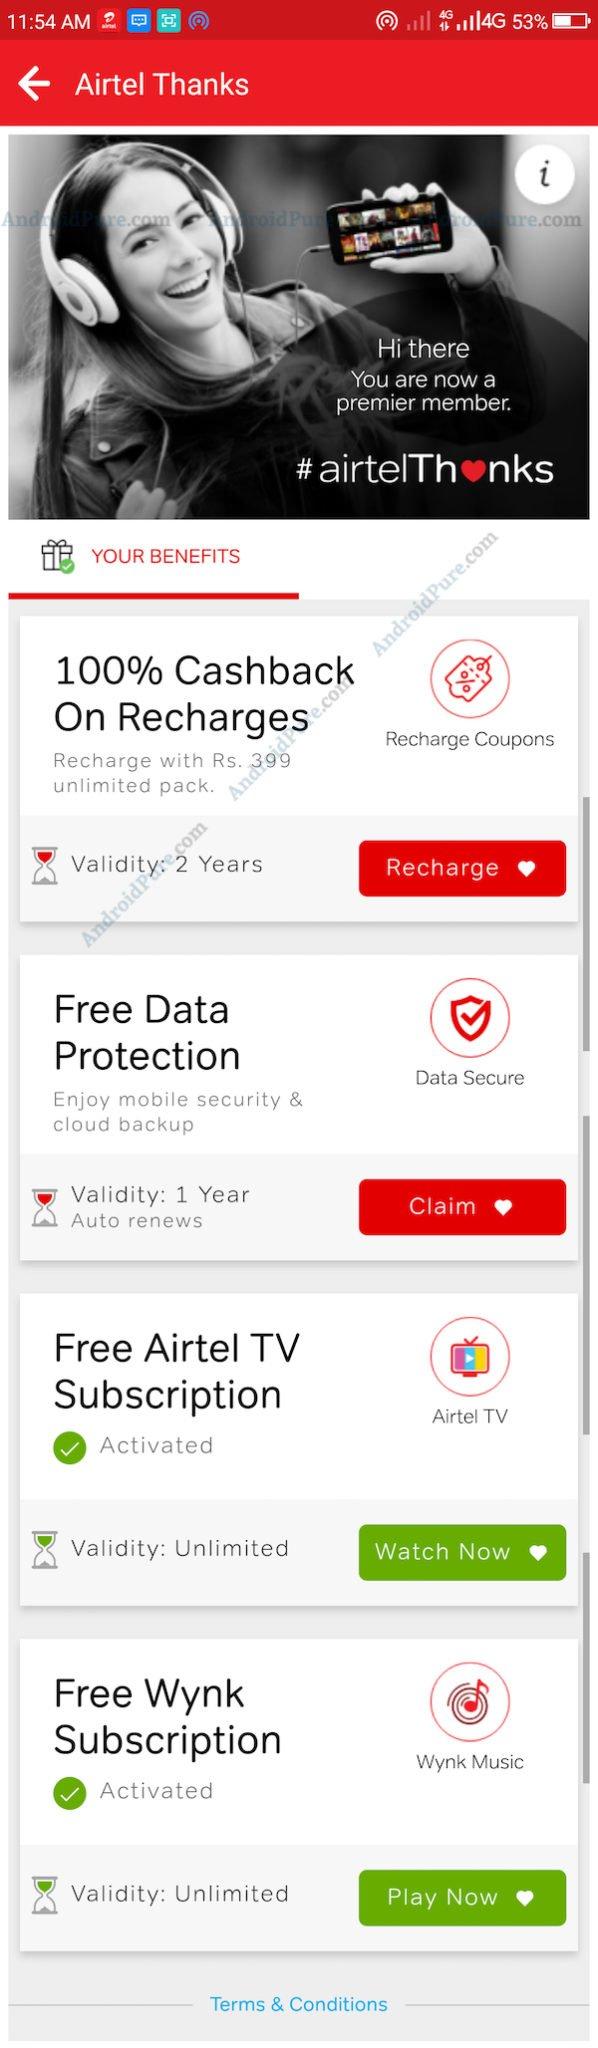 Airtel Thanks - AndroidPure